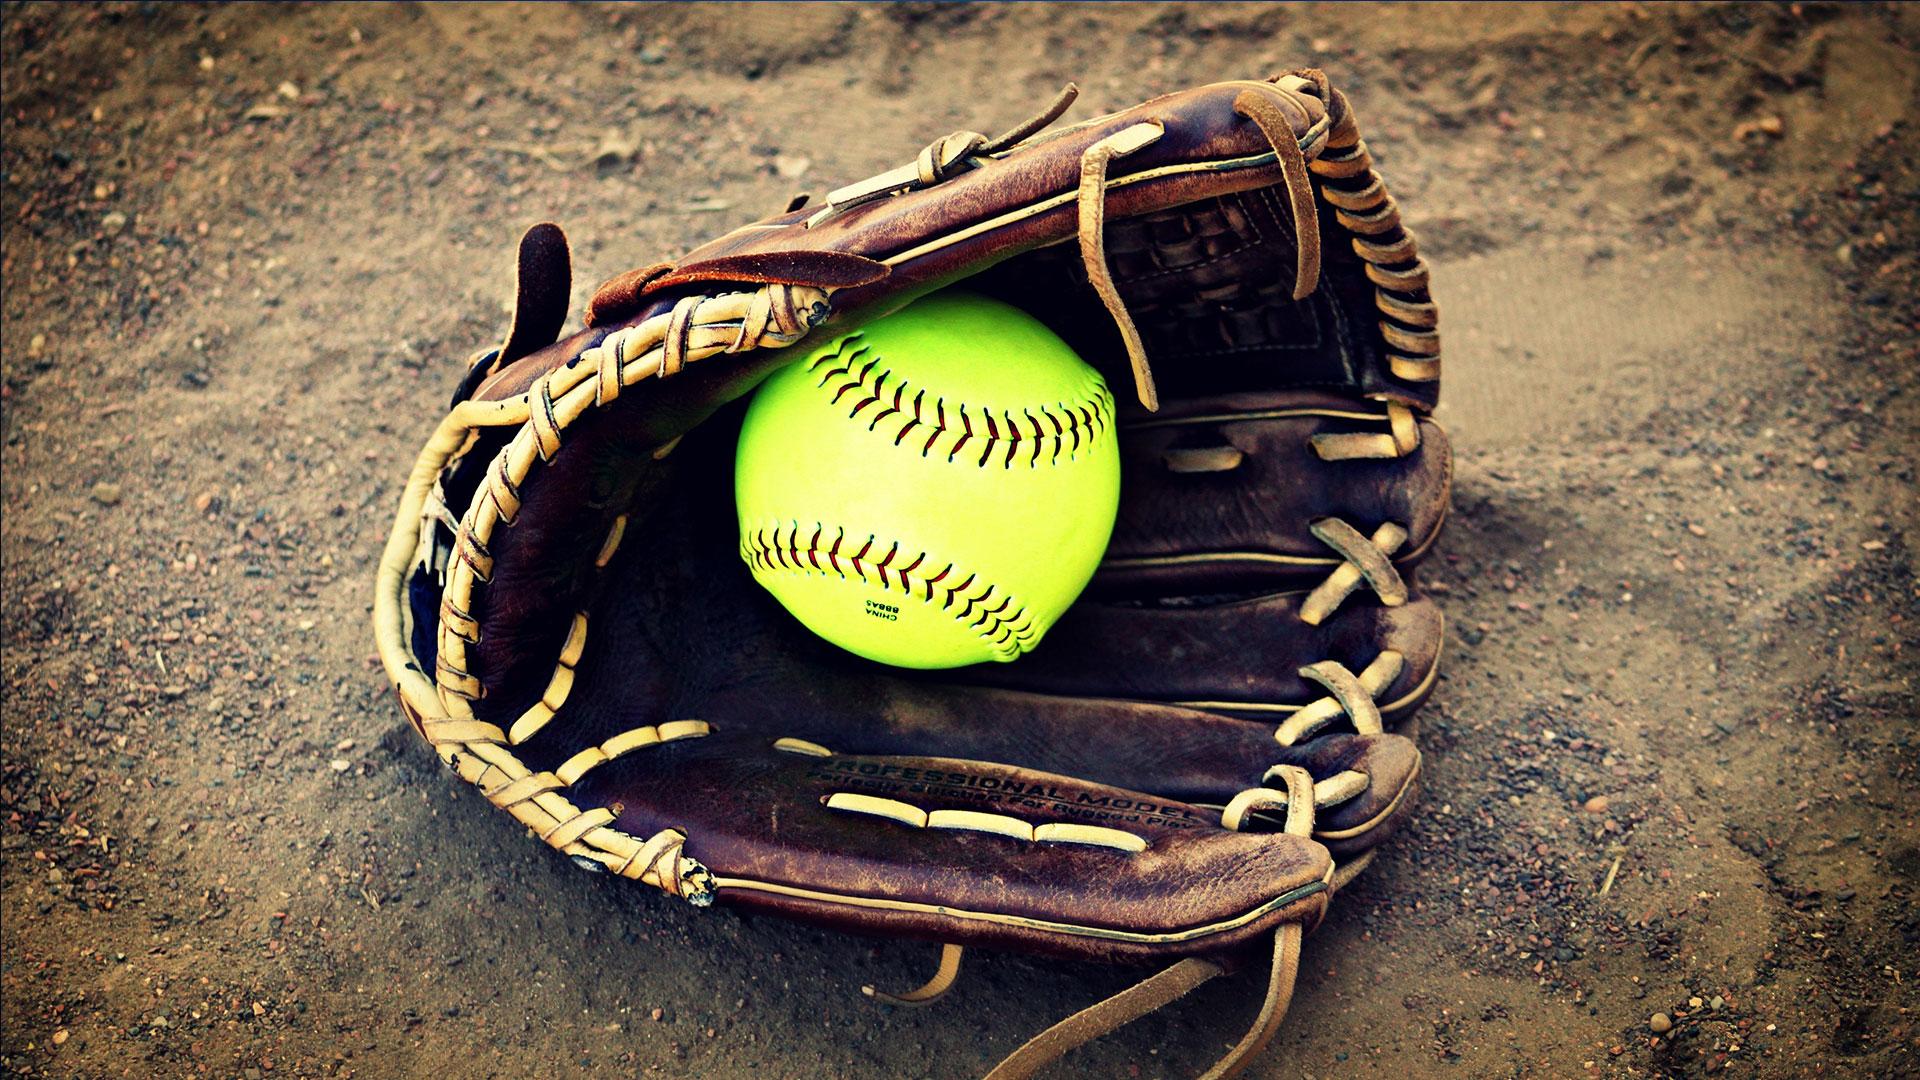 KELO-sports-generic-softball-2_1529437991135.jpg